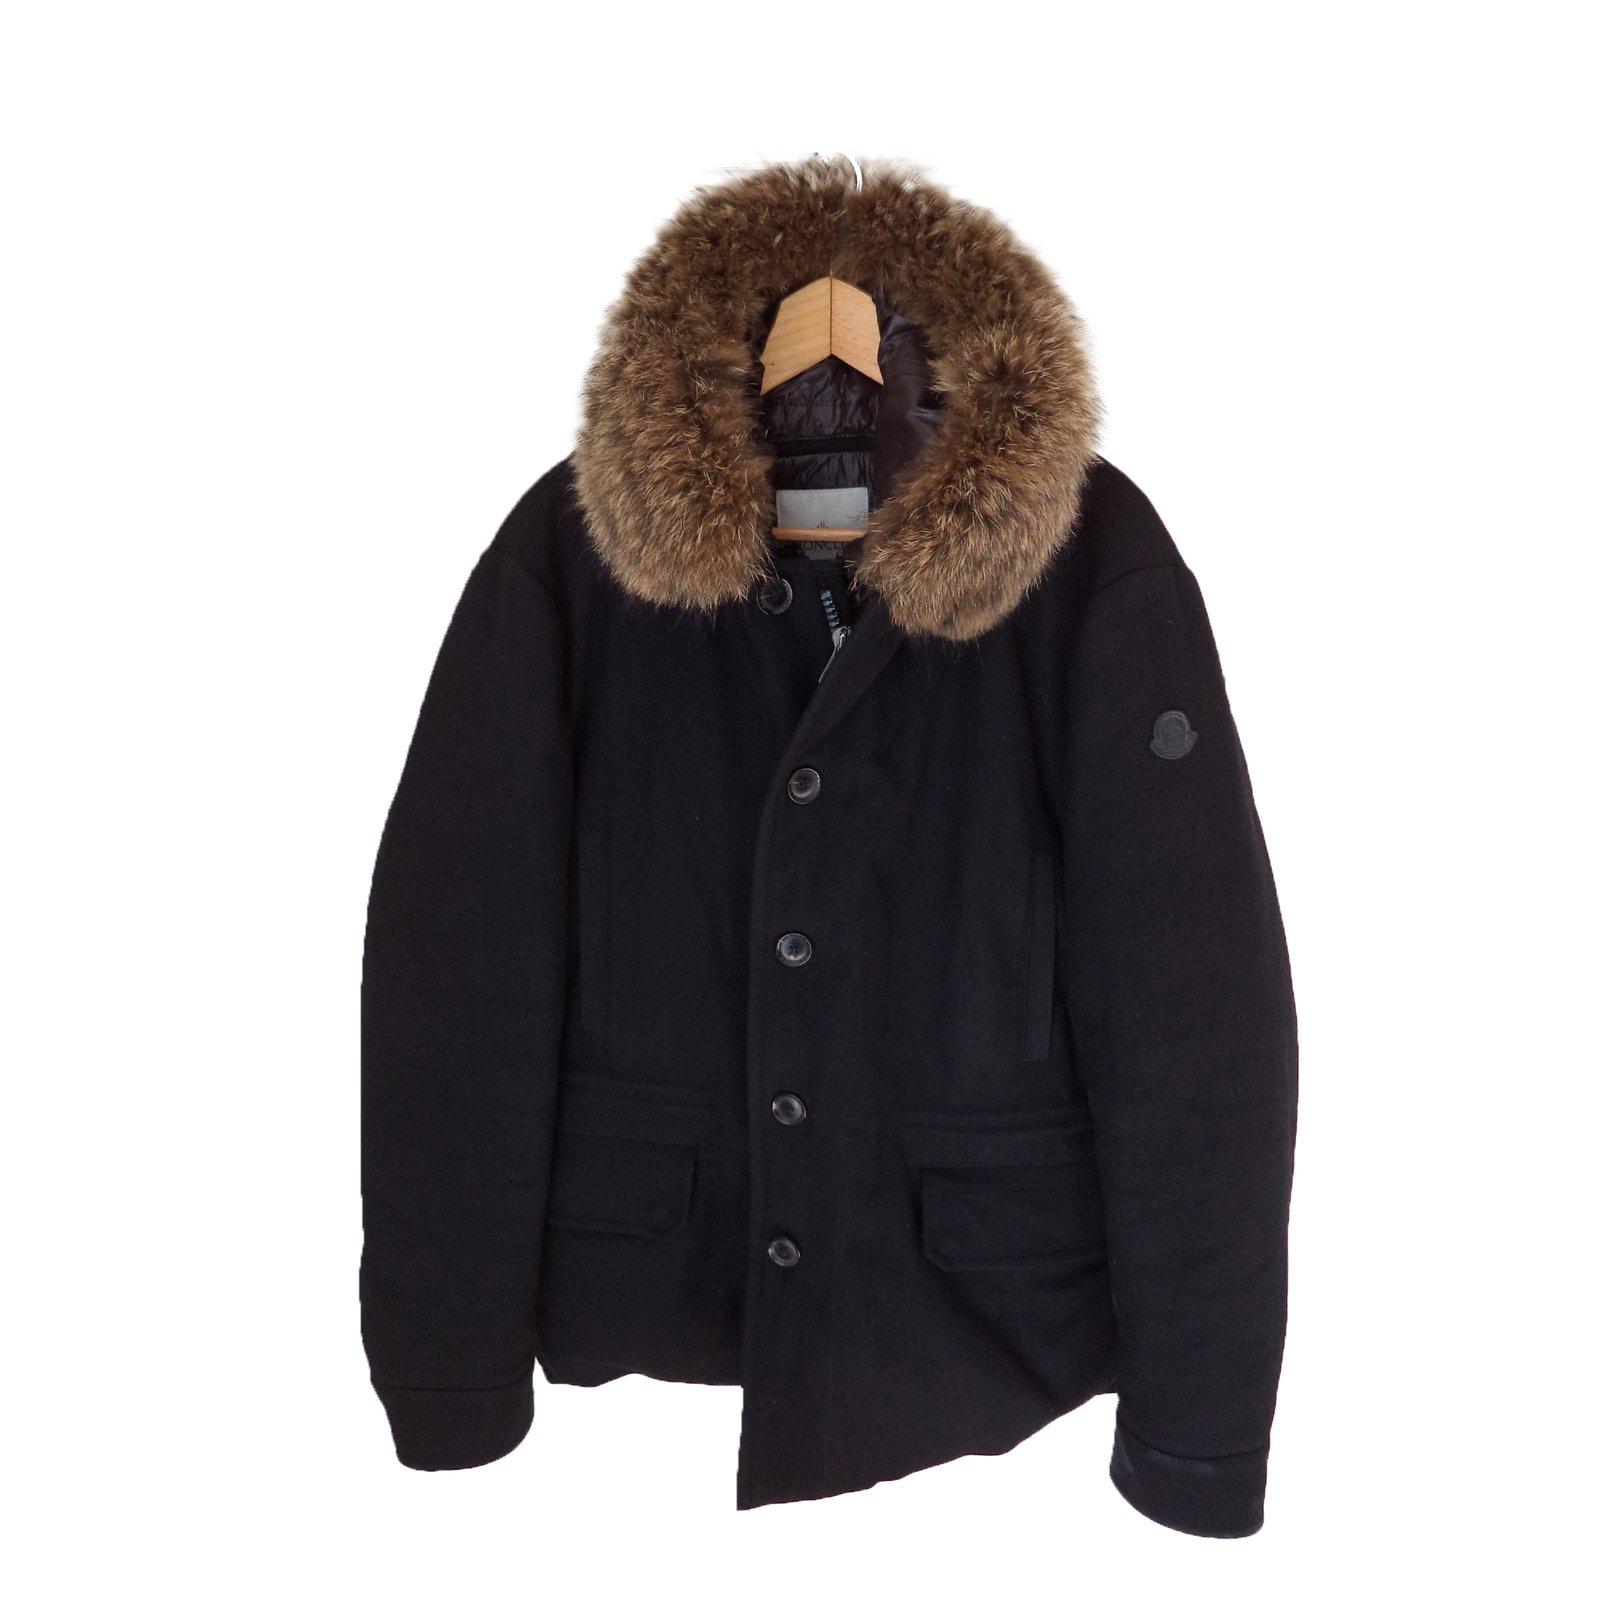 d35c30b077c6 inexpensive moncler wool coat 51fe1 f78c4